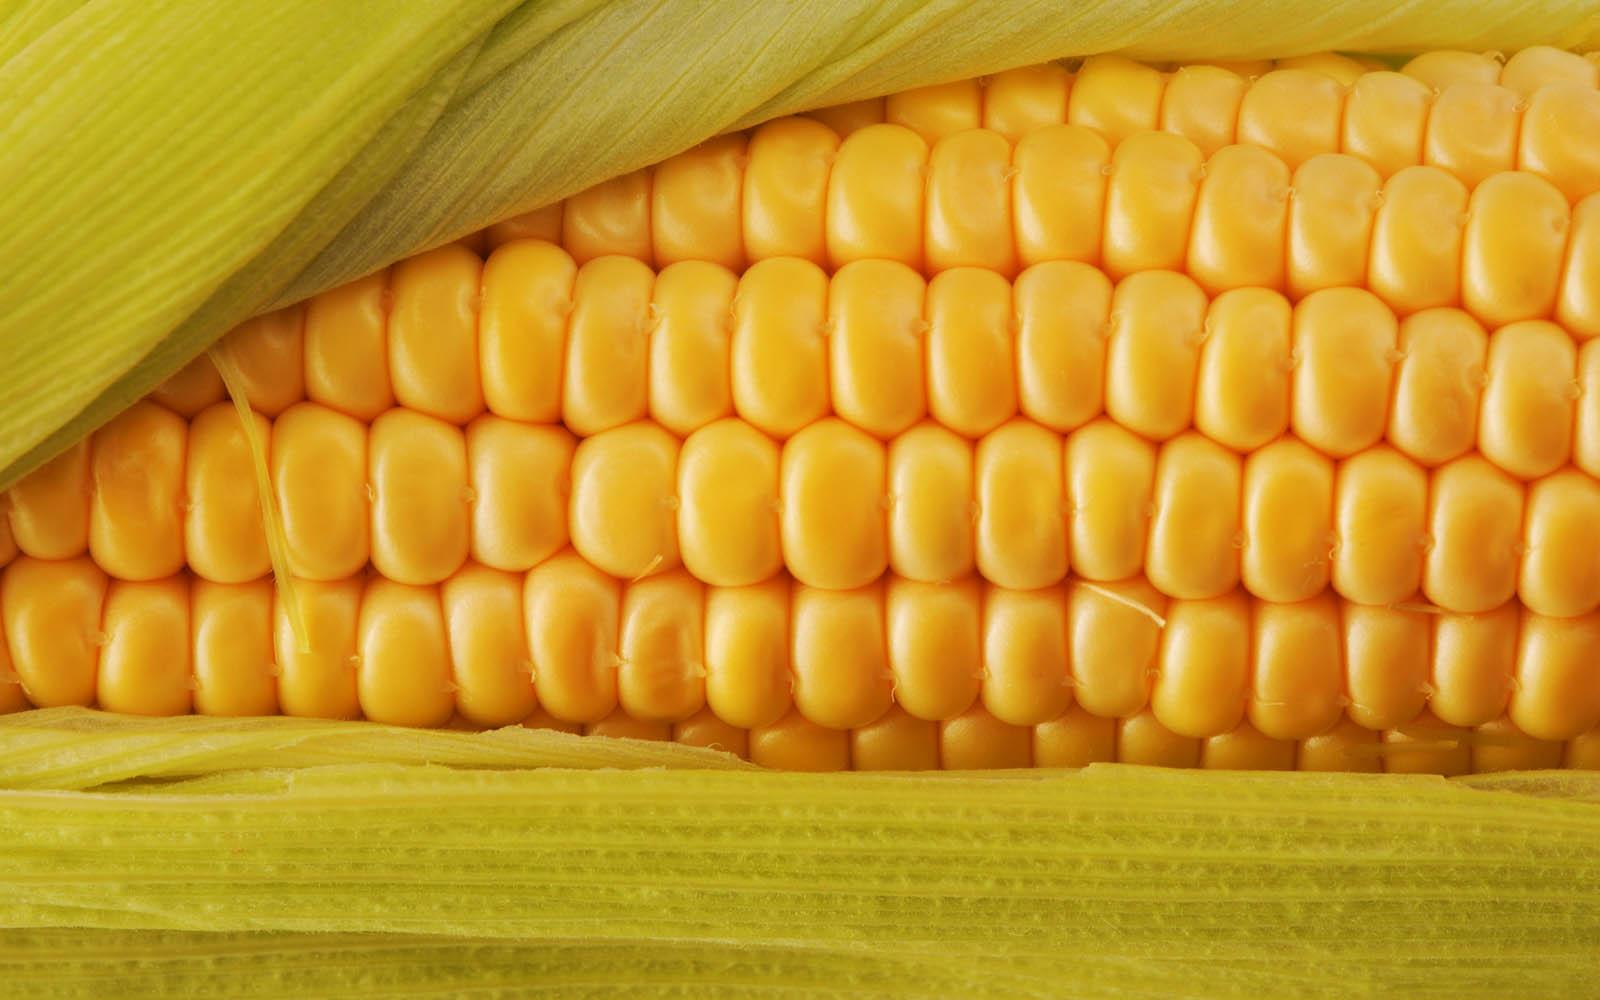 Sweet Home 3d Wallpaper Free Download Wallpapers Fresh Corn